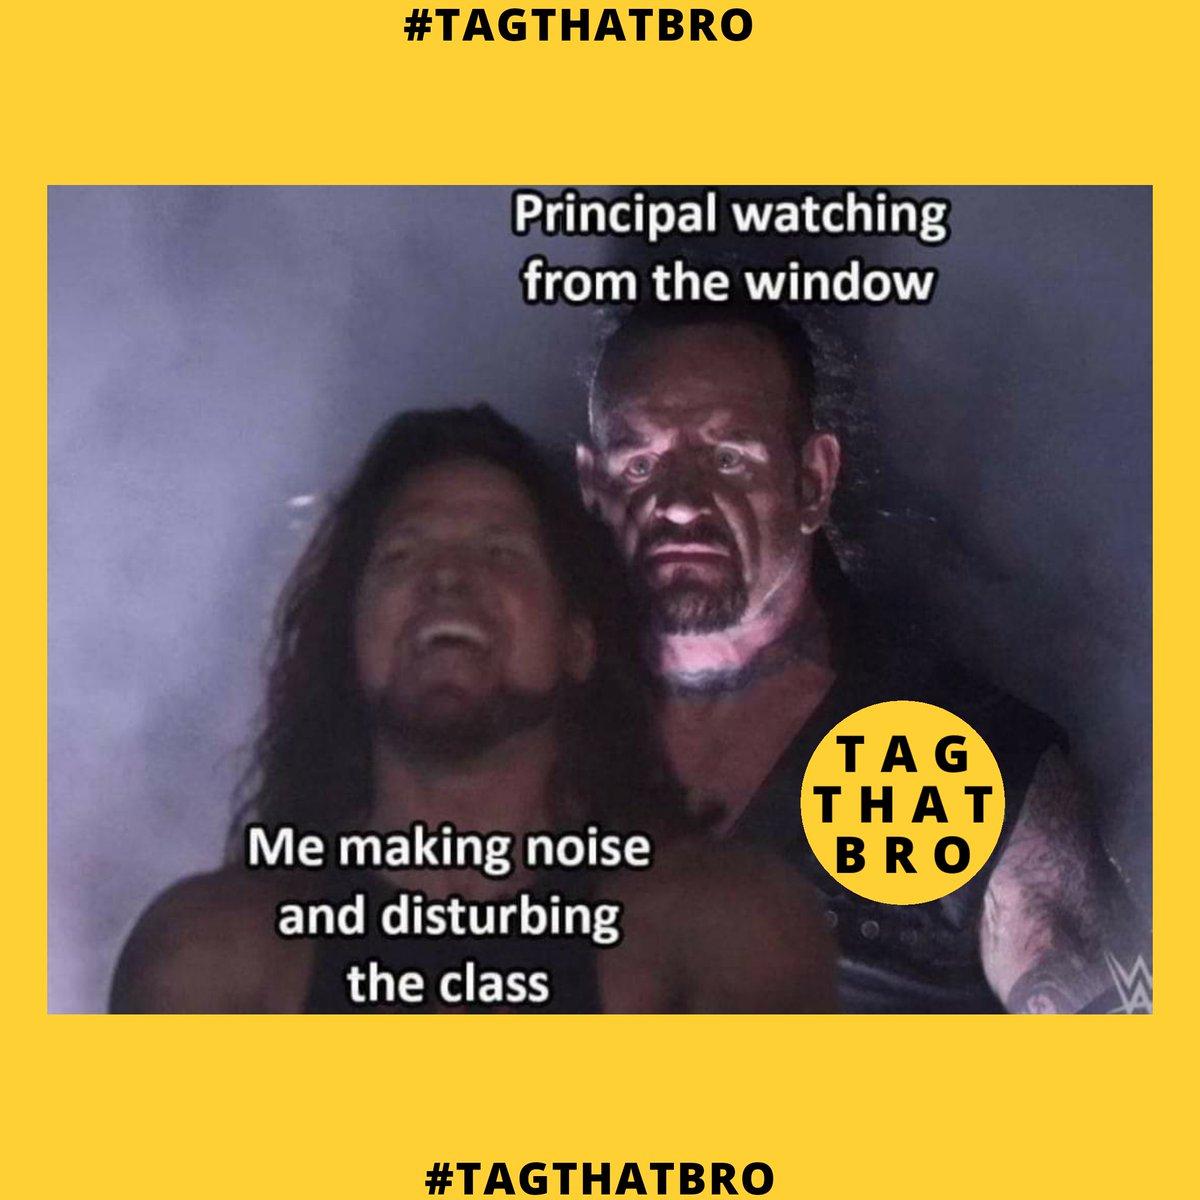 Tag That Bro - Follow us @tagthatbro  #tagthatbro #memes#dankmemes #memes#memesdaily #memesespanol #memestagram #funnymemes #edgymemes #memester #memesdank #memesfordays #memeschile #memesfunny #dailymemes #memess #memestar #memestagram #memesrlife #memesquad pic.twitter.com/dtpPJMvzRH